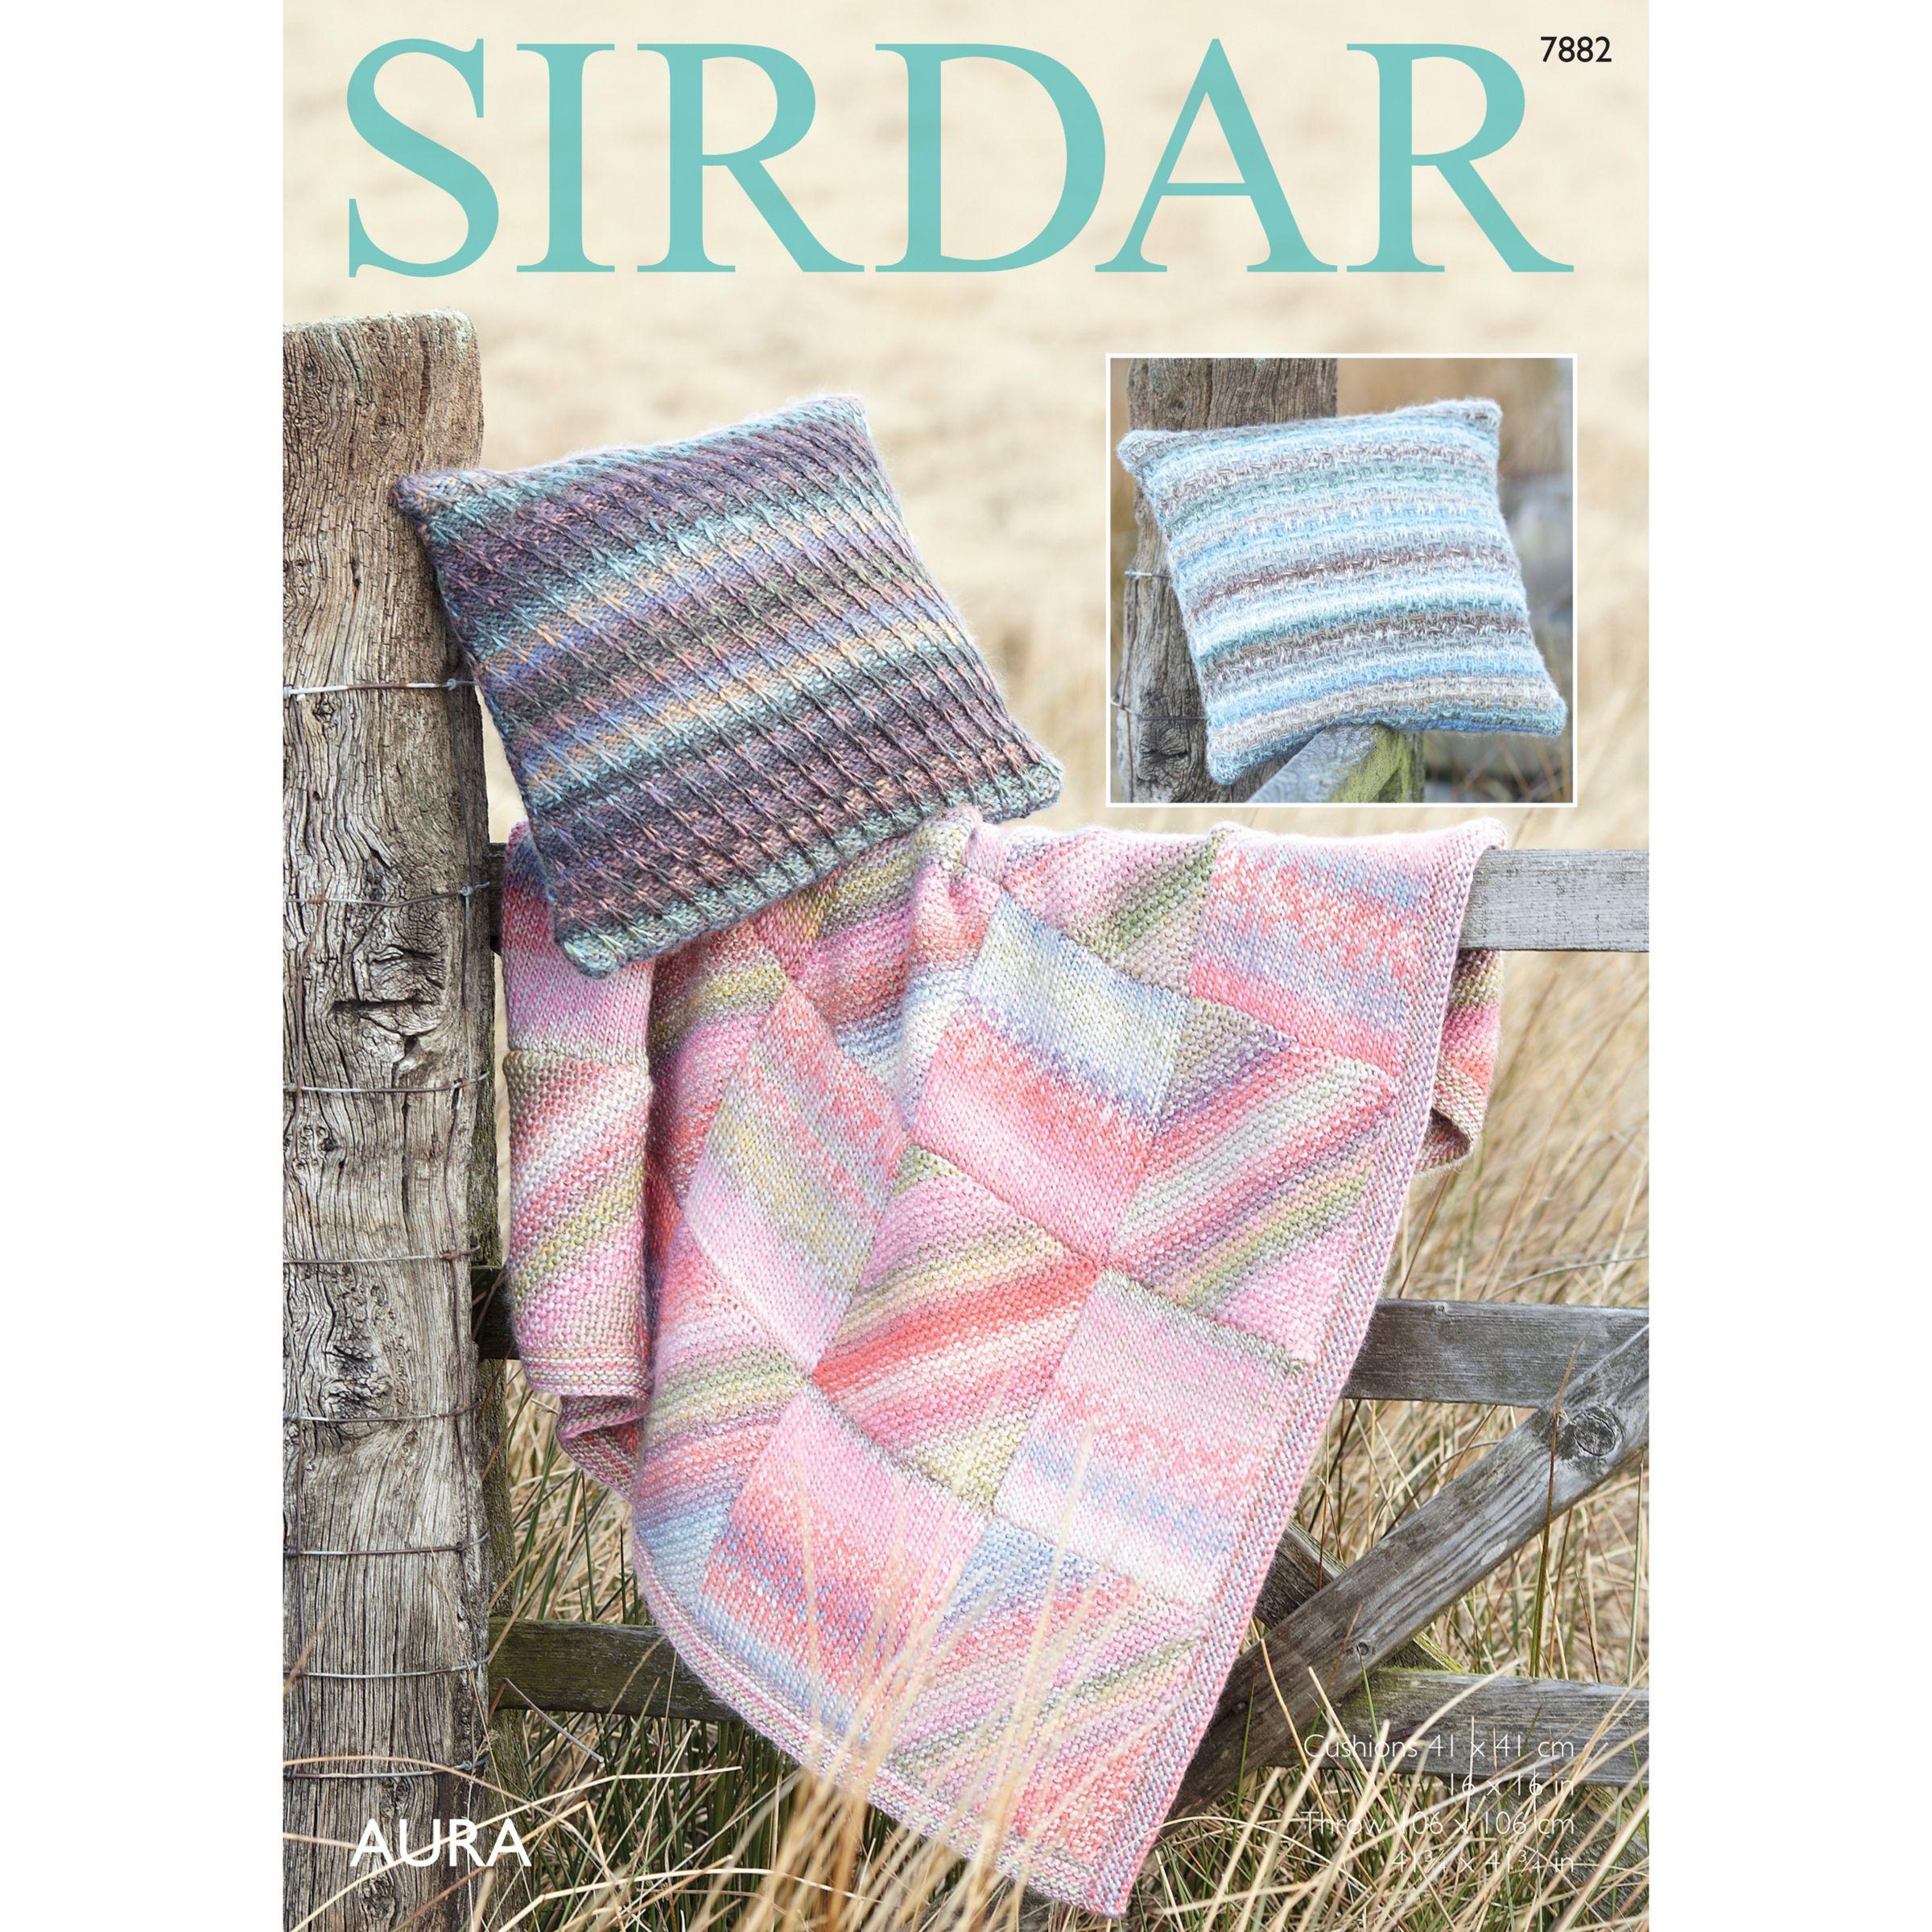 Sirdar Sirdar Aura Chunky Throw and Cushion Cover Knitting Pattern, 7882